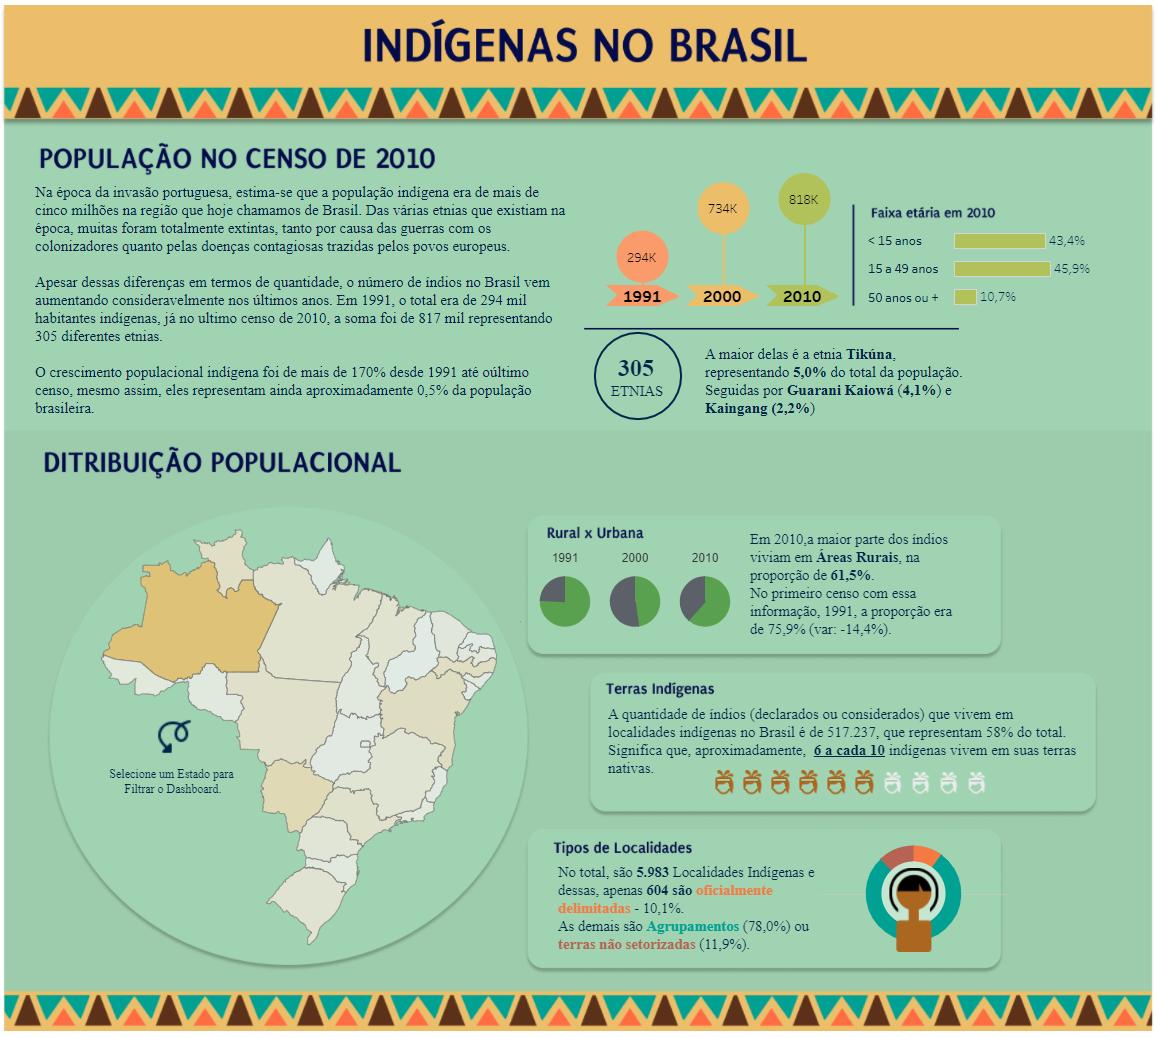 população indígena no brasil